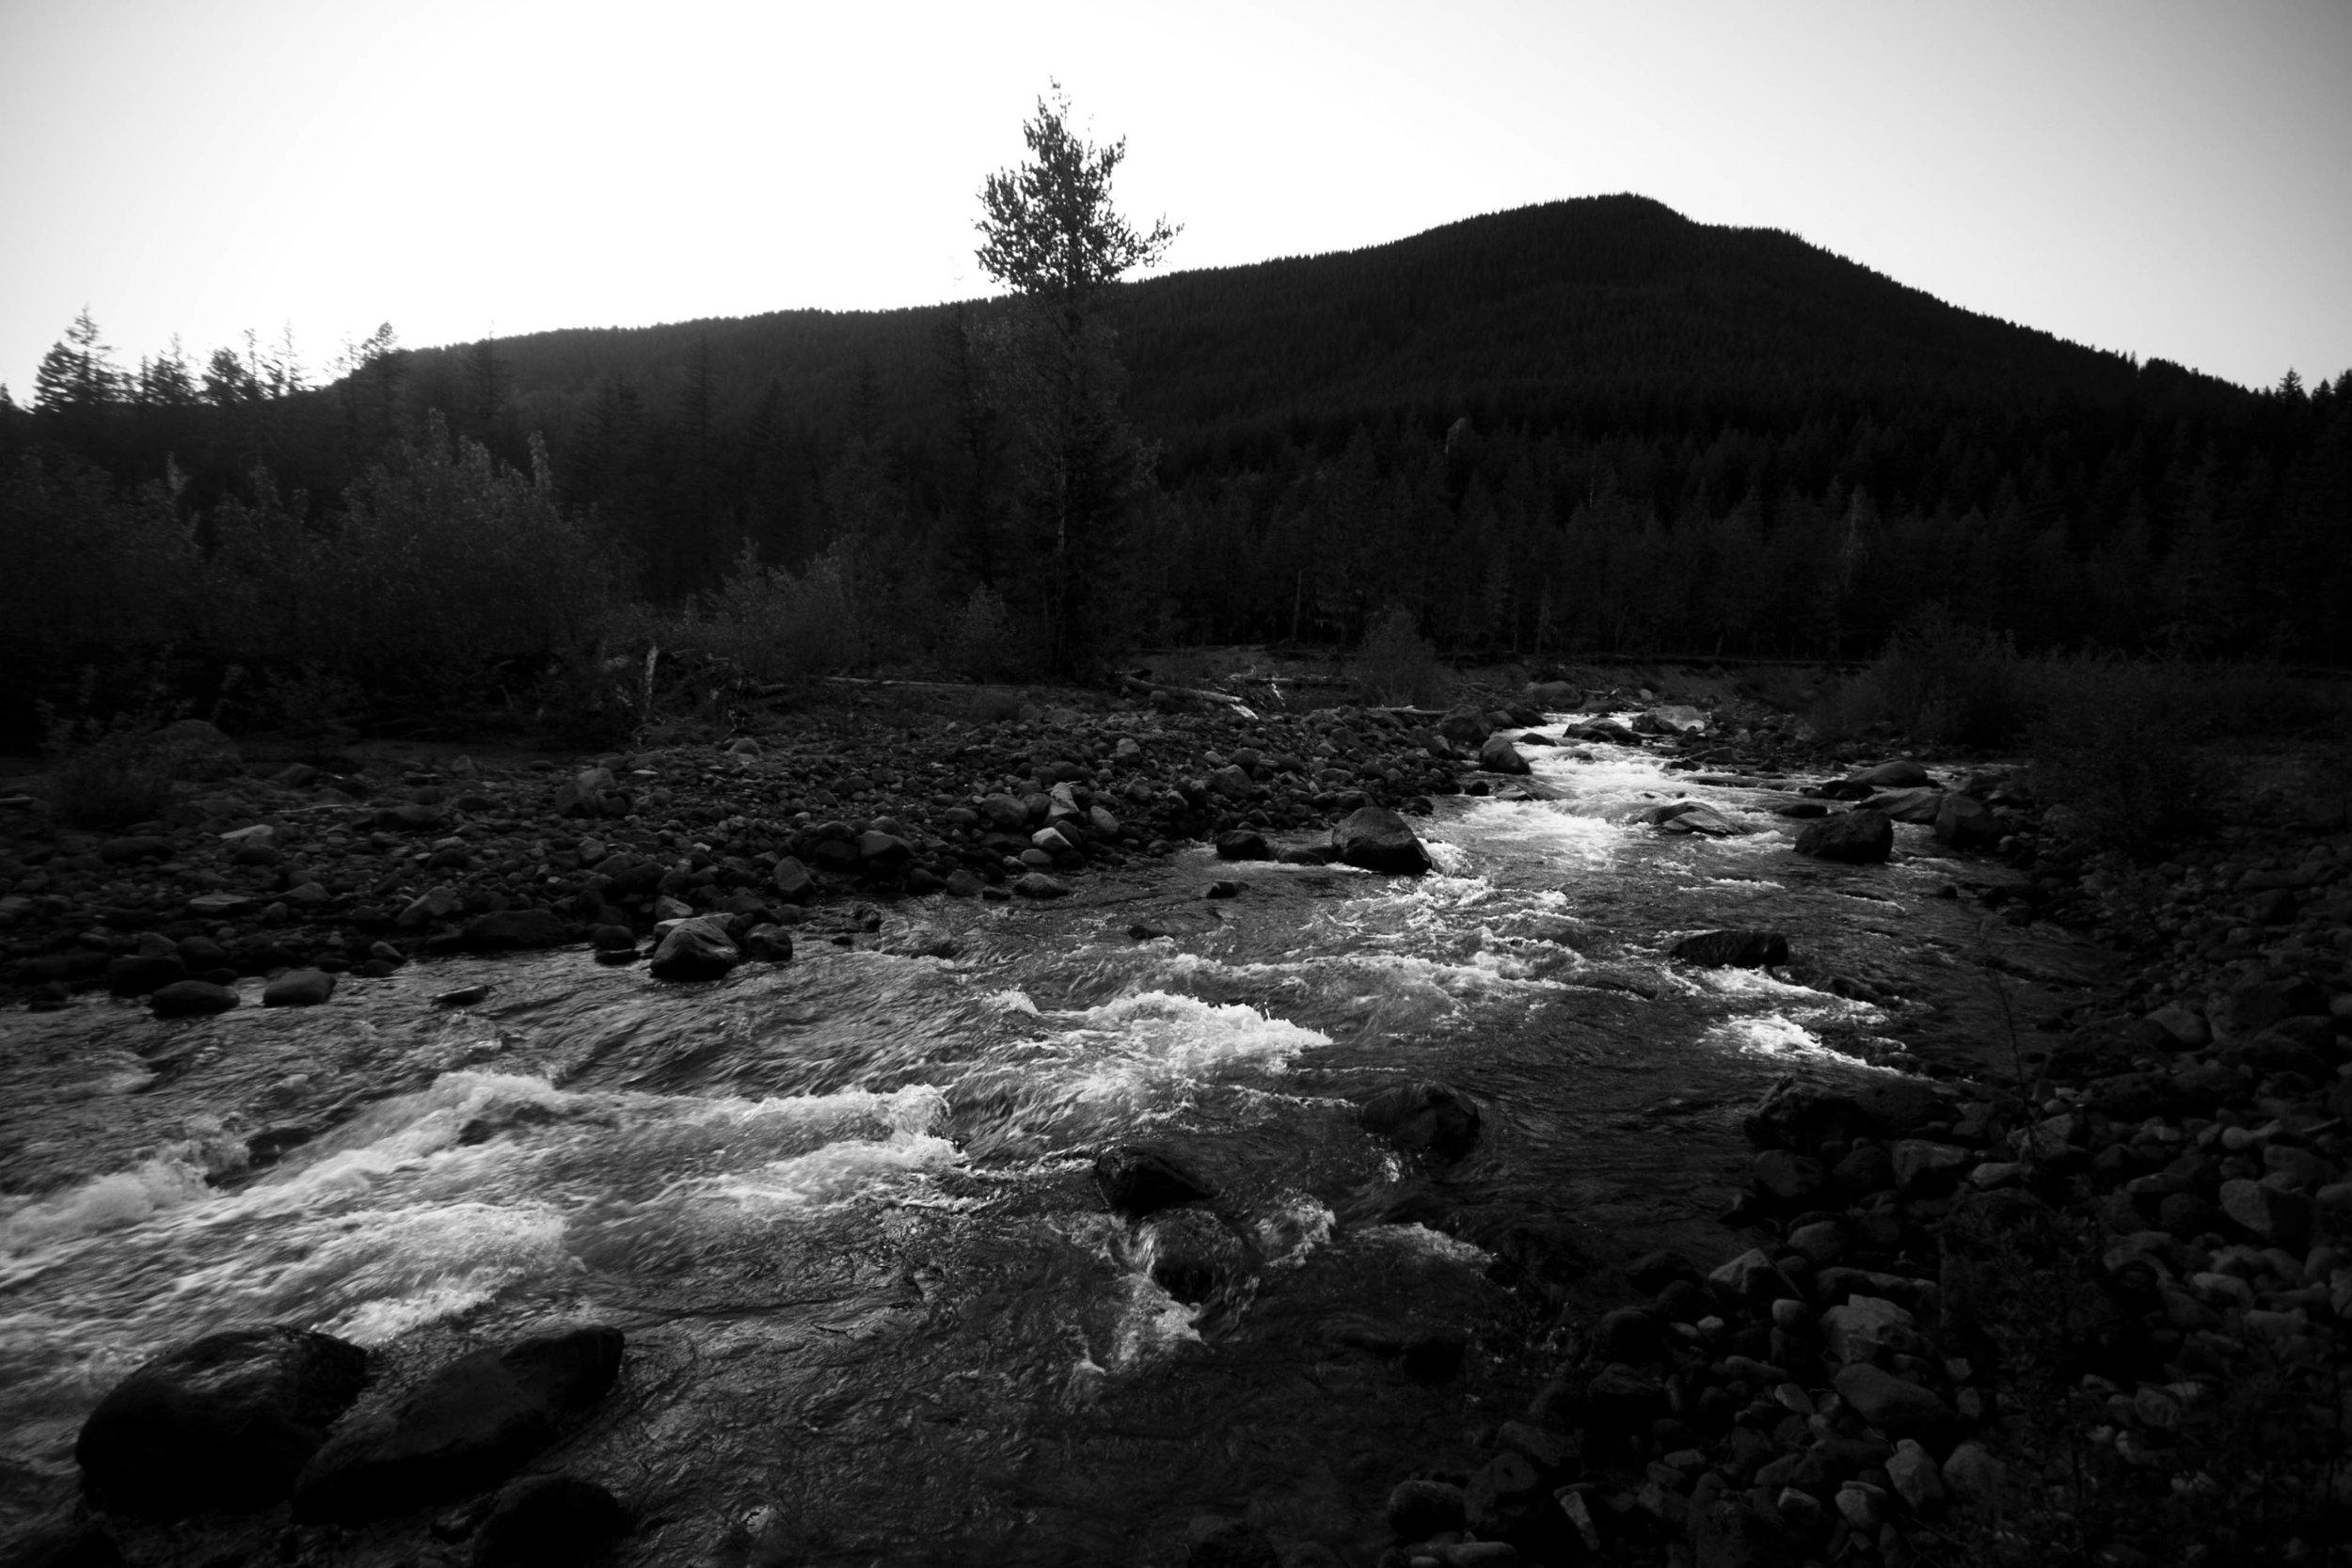 river sillhouette.jpg